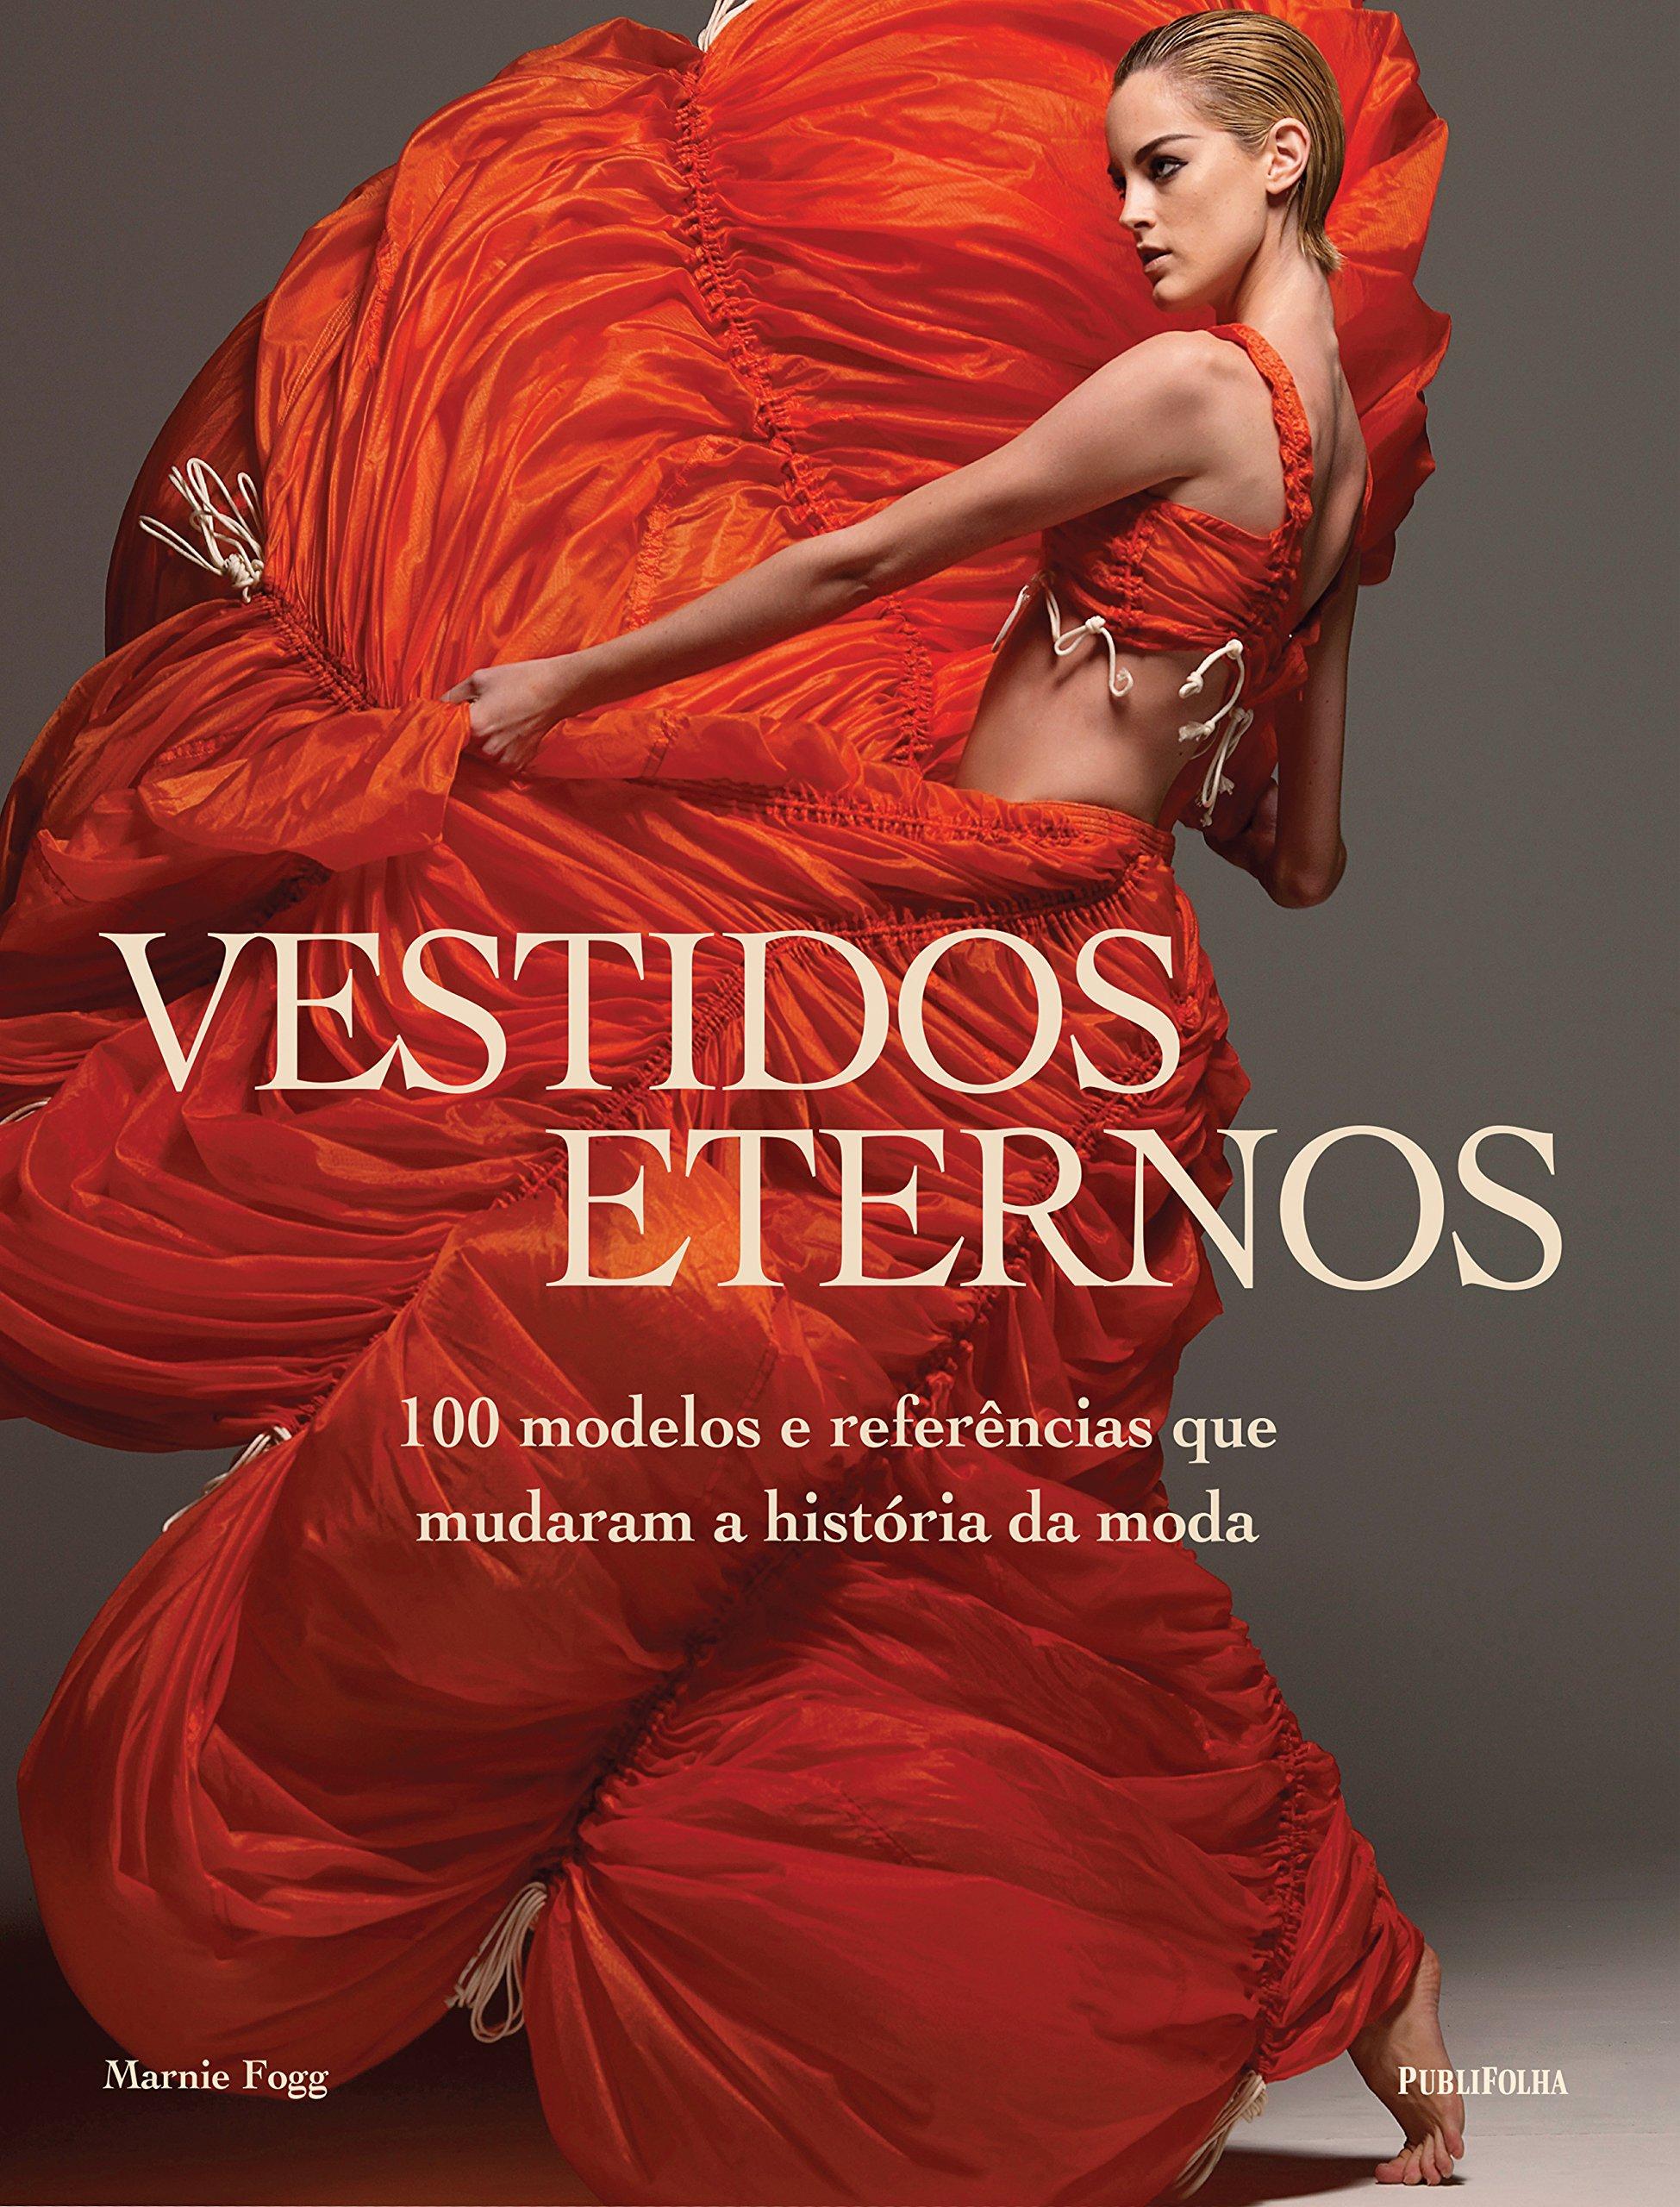 Vestidos Eternos (Em Portuguese do Brasil): Amazon.es: Marnie Fogg: Libros